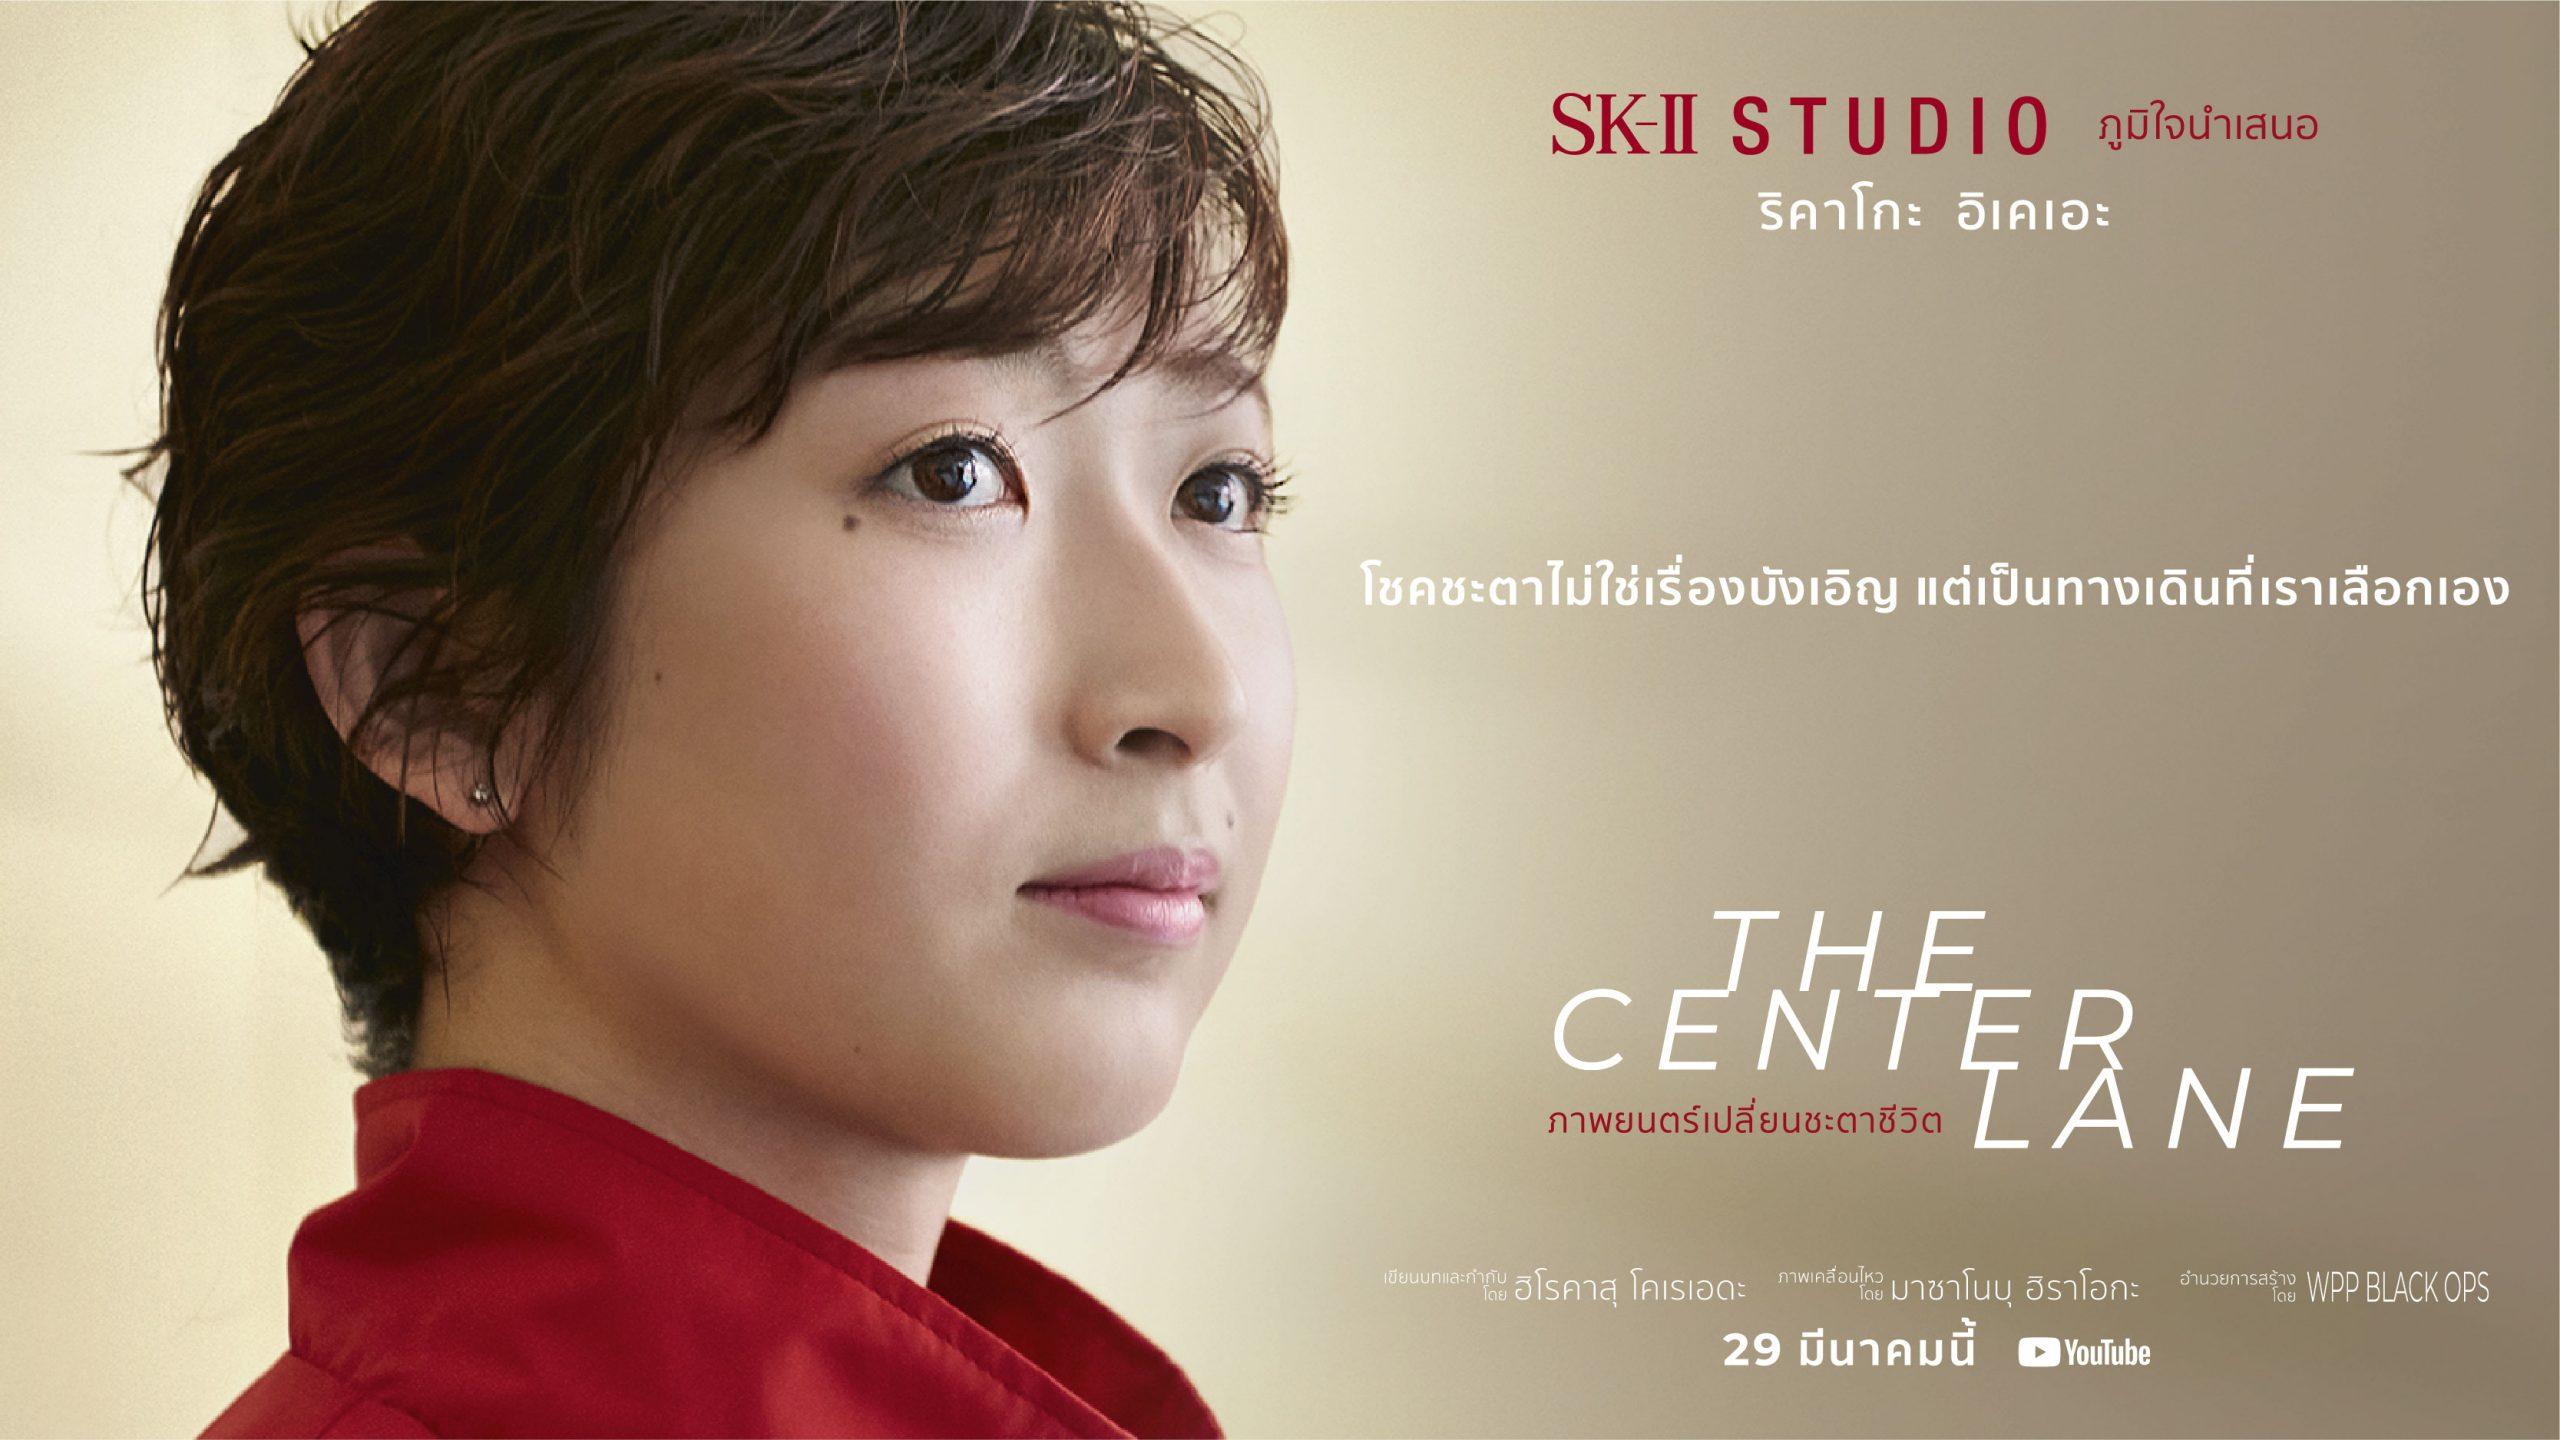 Rikako Ikee SK-II STUDIO The Center Lane ริคาโกะ อิเคเอะ เอสเค-ทู